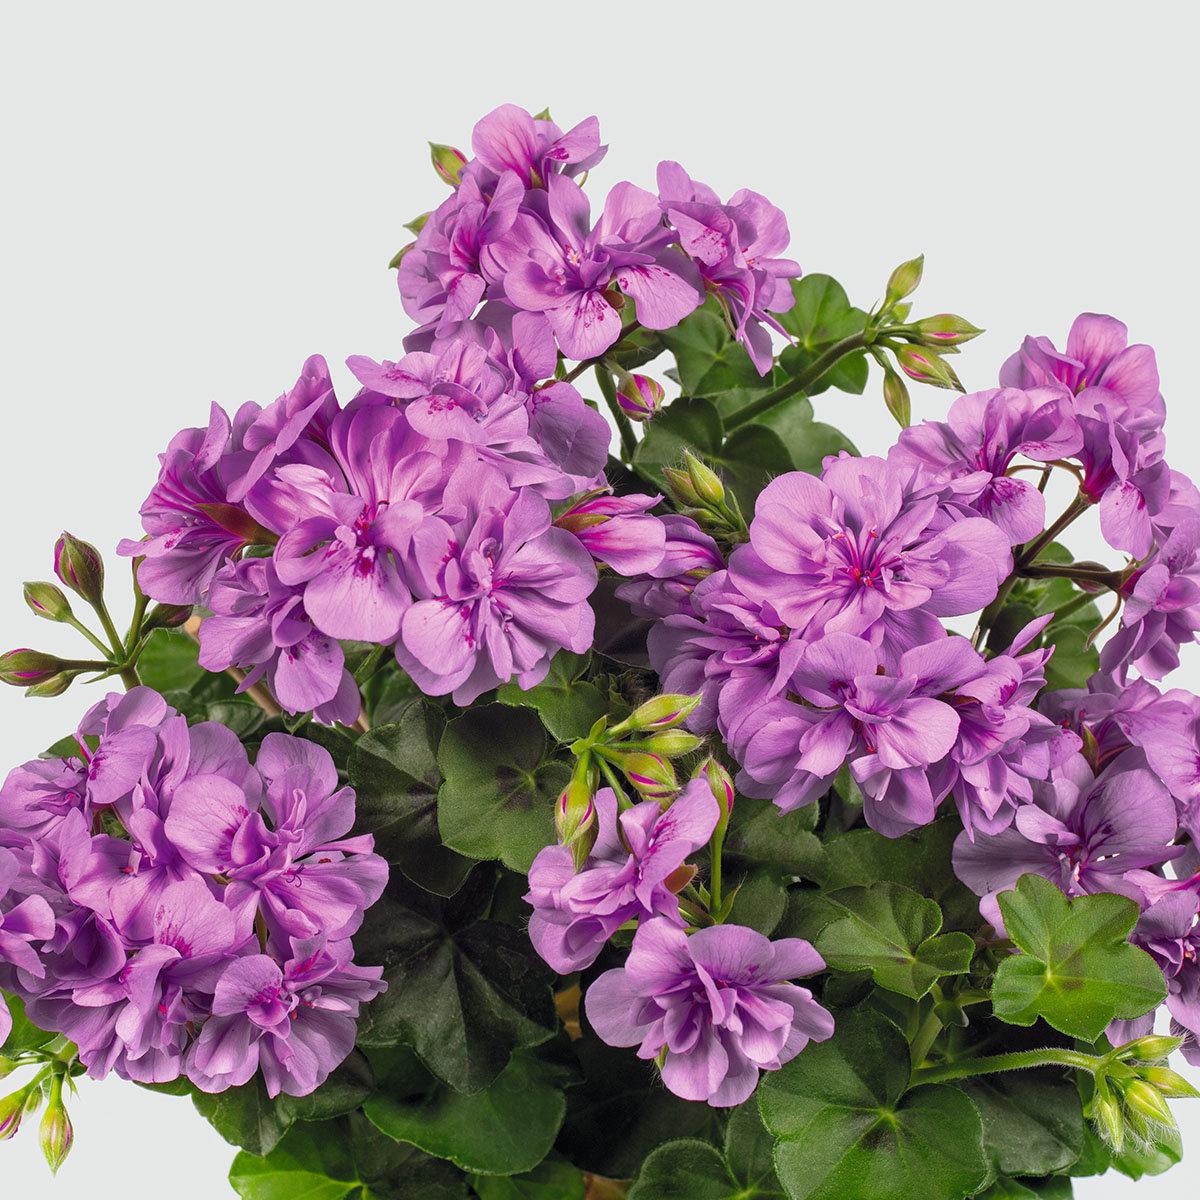 Violette Hänge-Geranie  Amelit, im ca. 12 cm-Topf | #4